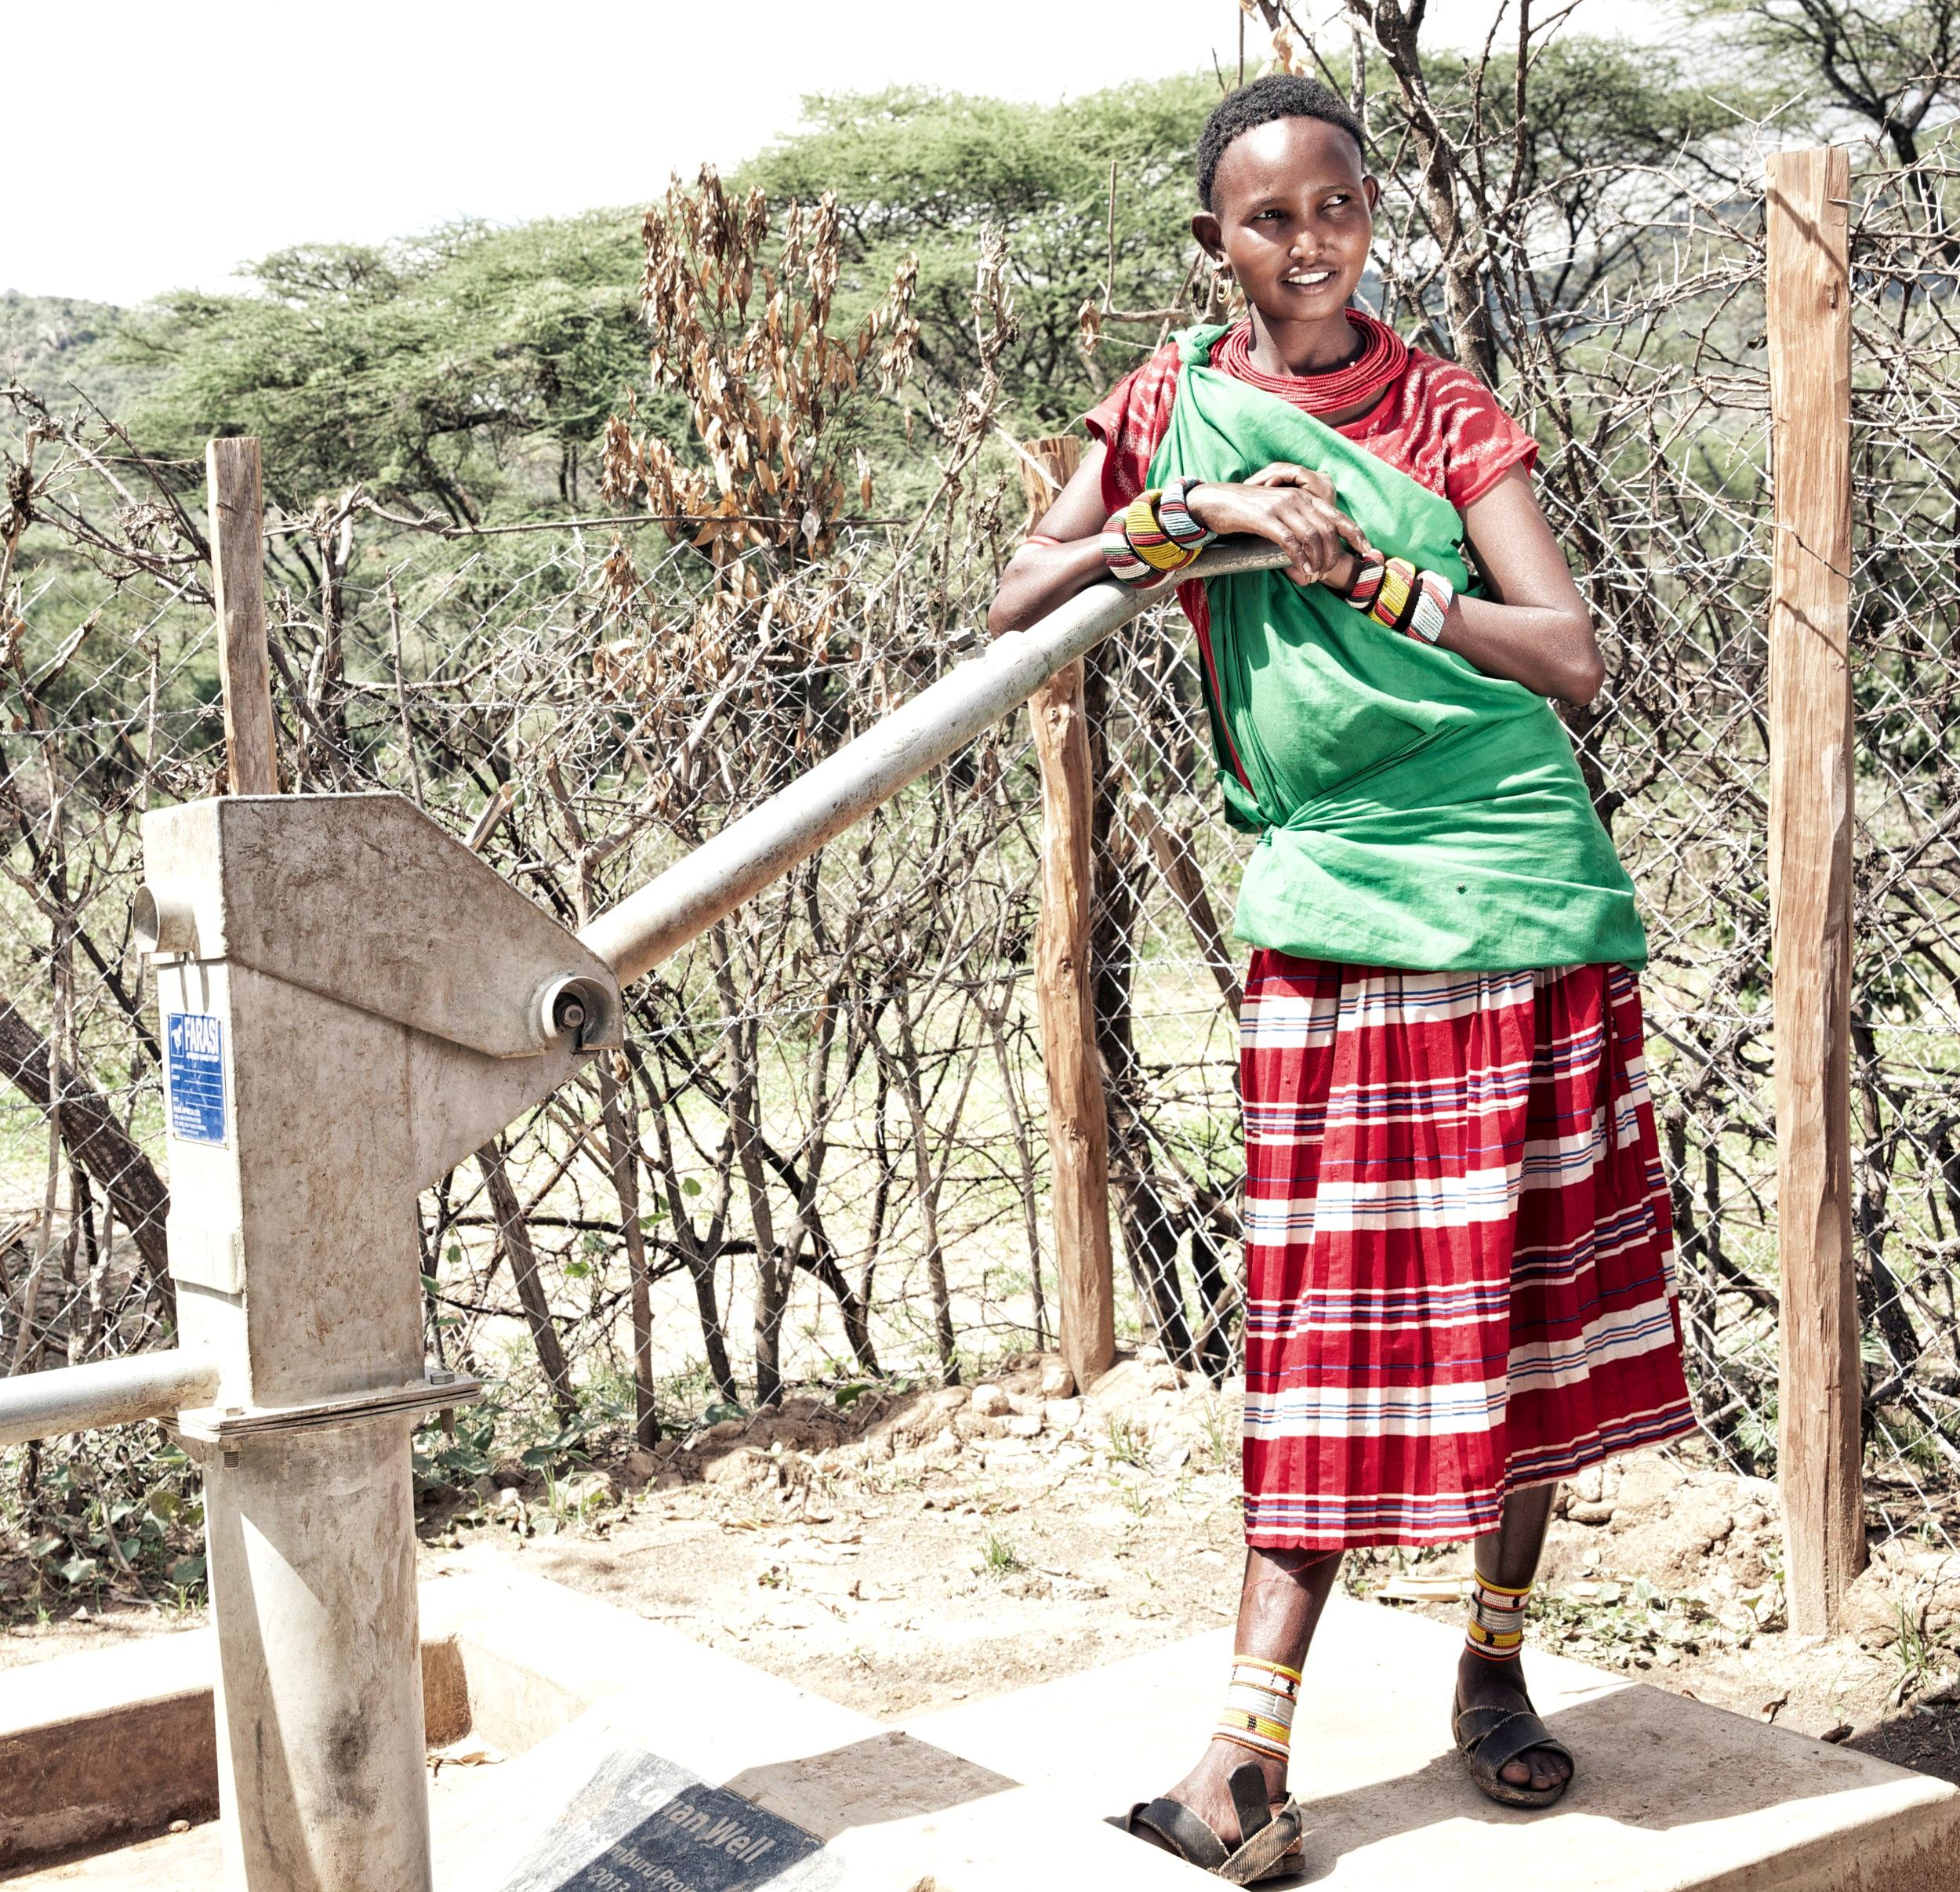 Young Girl pumping water, Samburu Kenya Africa